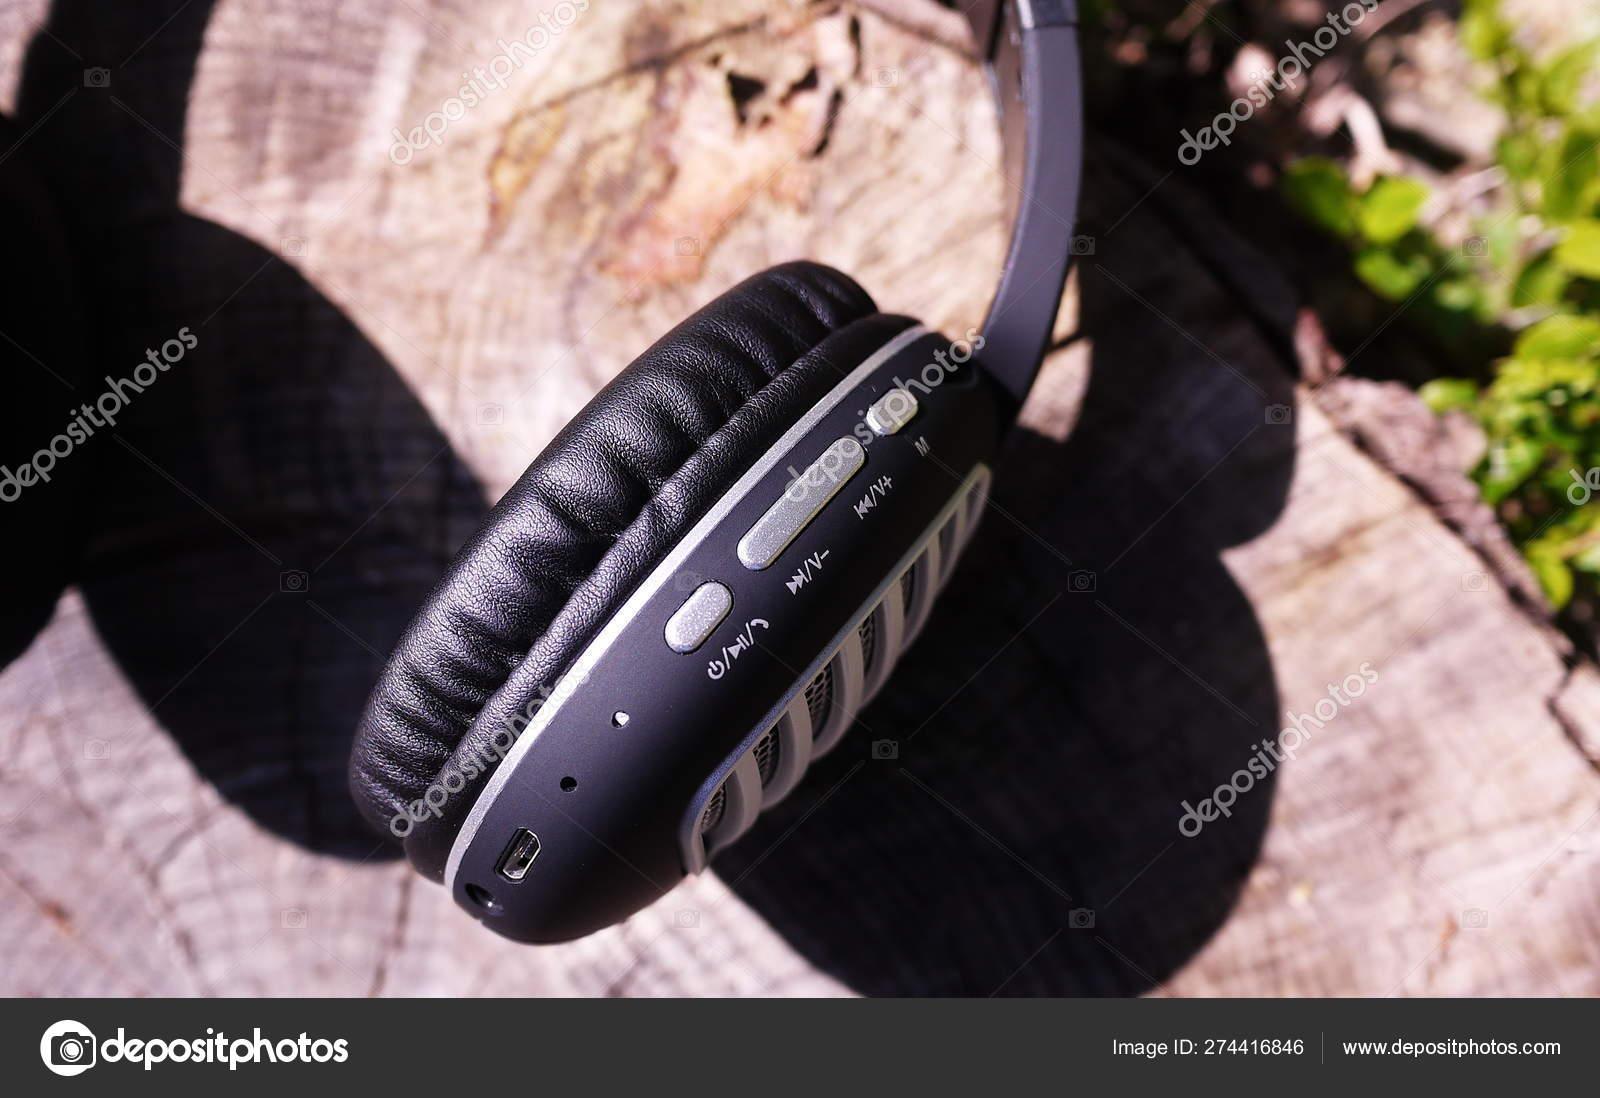 Slip for ledningen: Bluetooth-højtalere overtager markedet